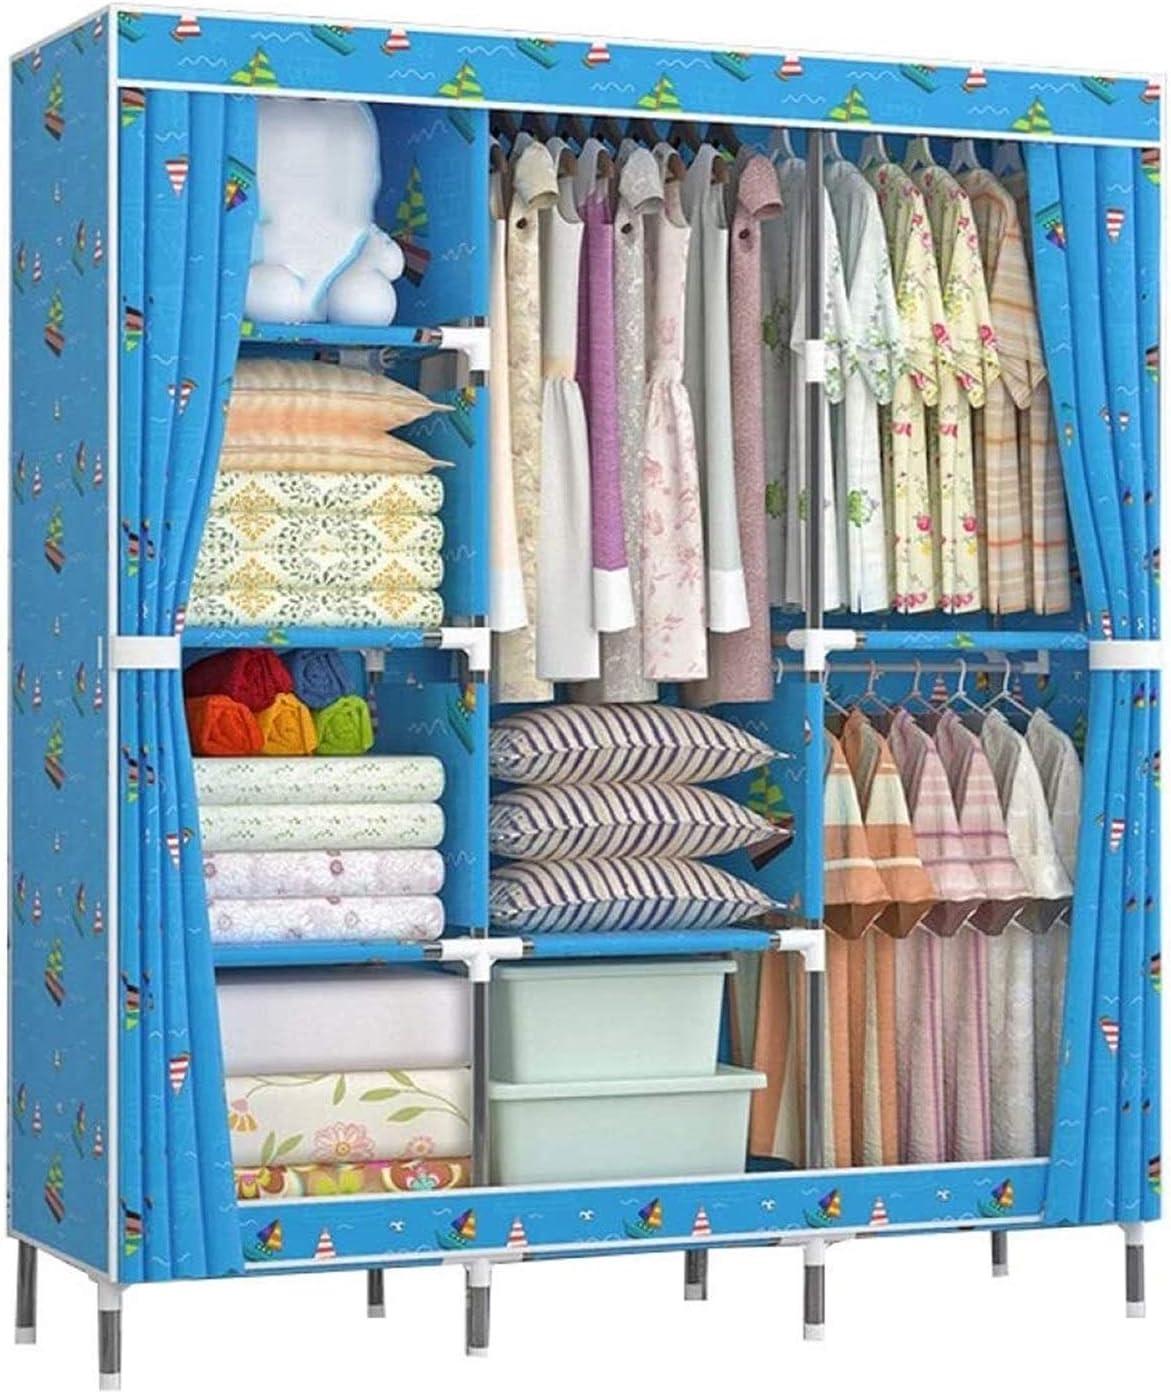 Year-end annual account LLCY Portable Closet Organizer Clothes Daily bargain sale S Wardrobe